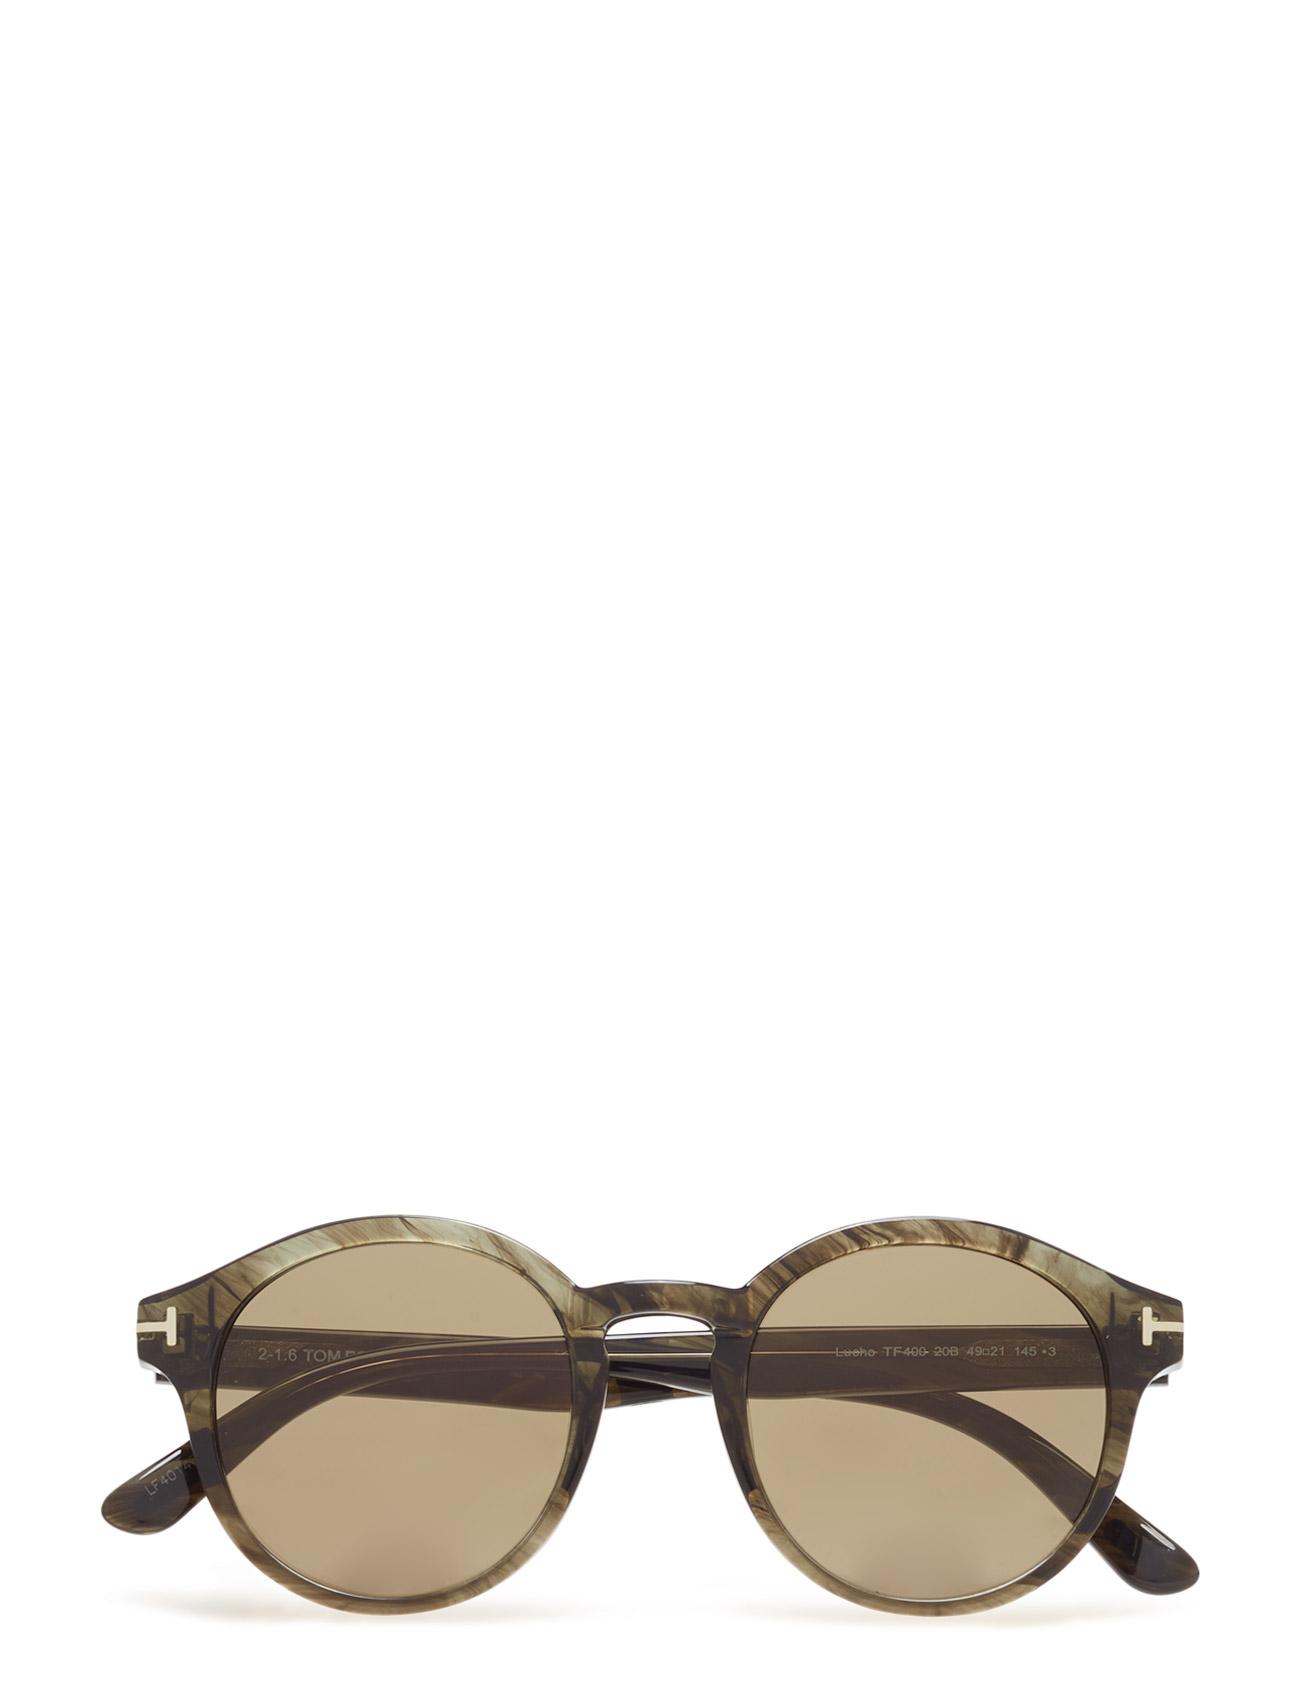 Tom Ford Lucho Tom Ford Sunglasses Solbriller til Damer i